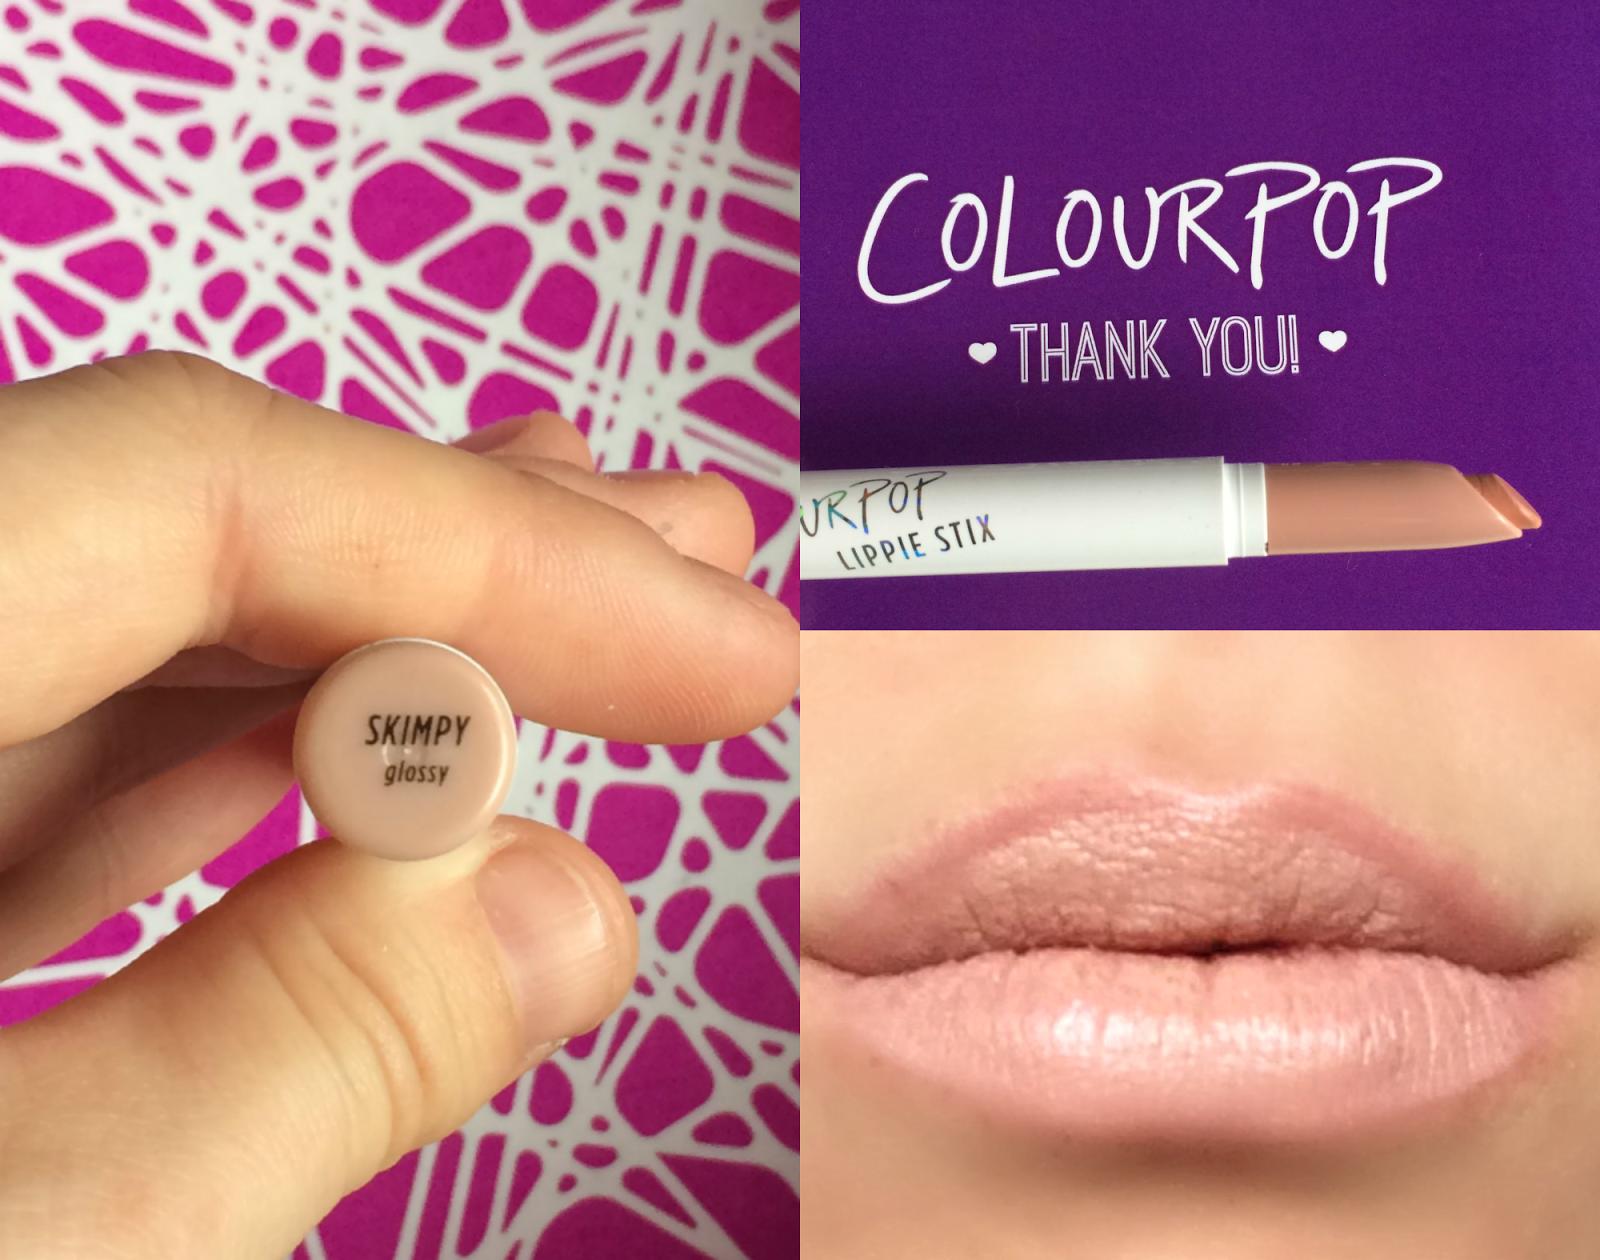 ColourPop Skimpy Colourpop, Colourpop cosmetics, Cosmetics